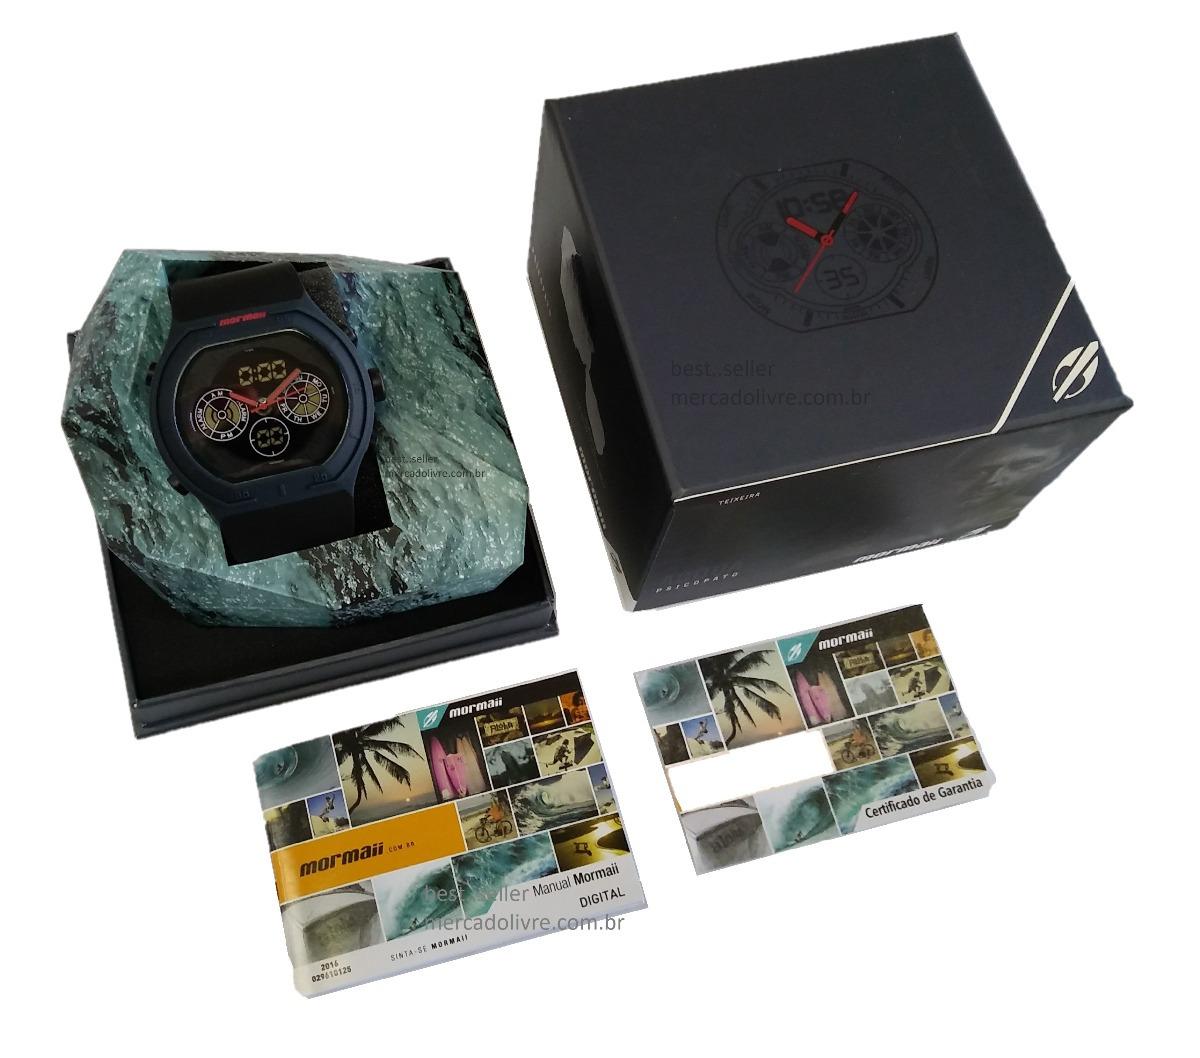 0c108ead3fe Relógio Mormaii Mo160323aj 8a Mo1608b 8c Mo160323al Pato - R  329